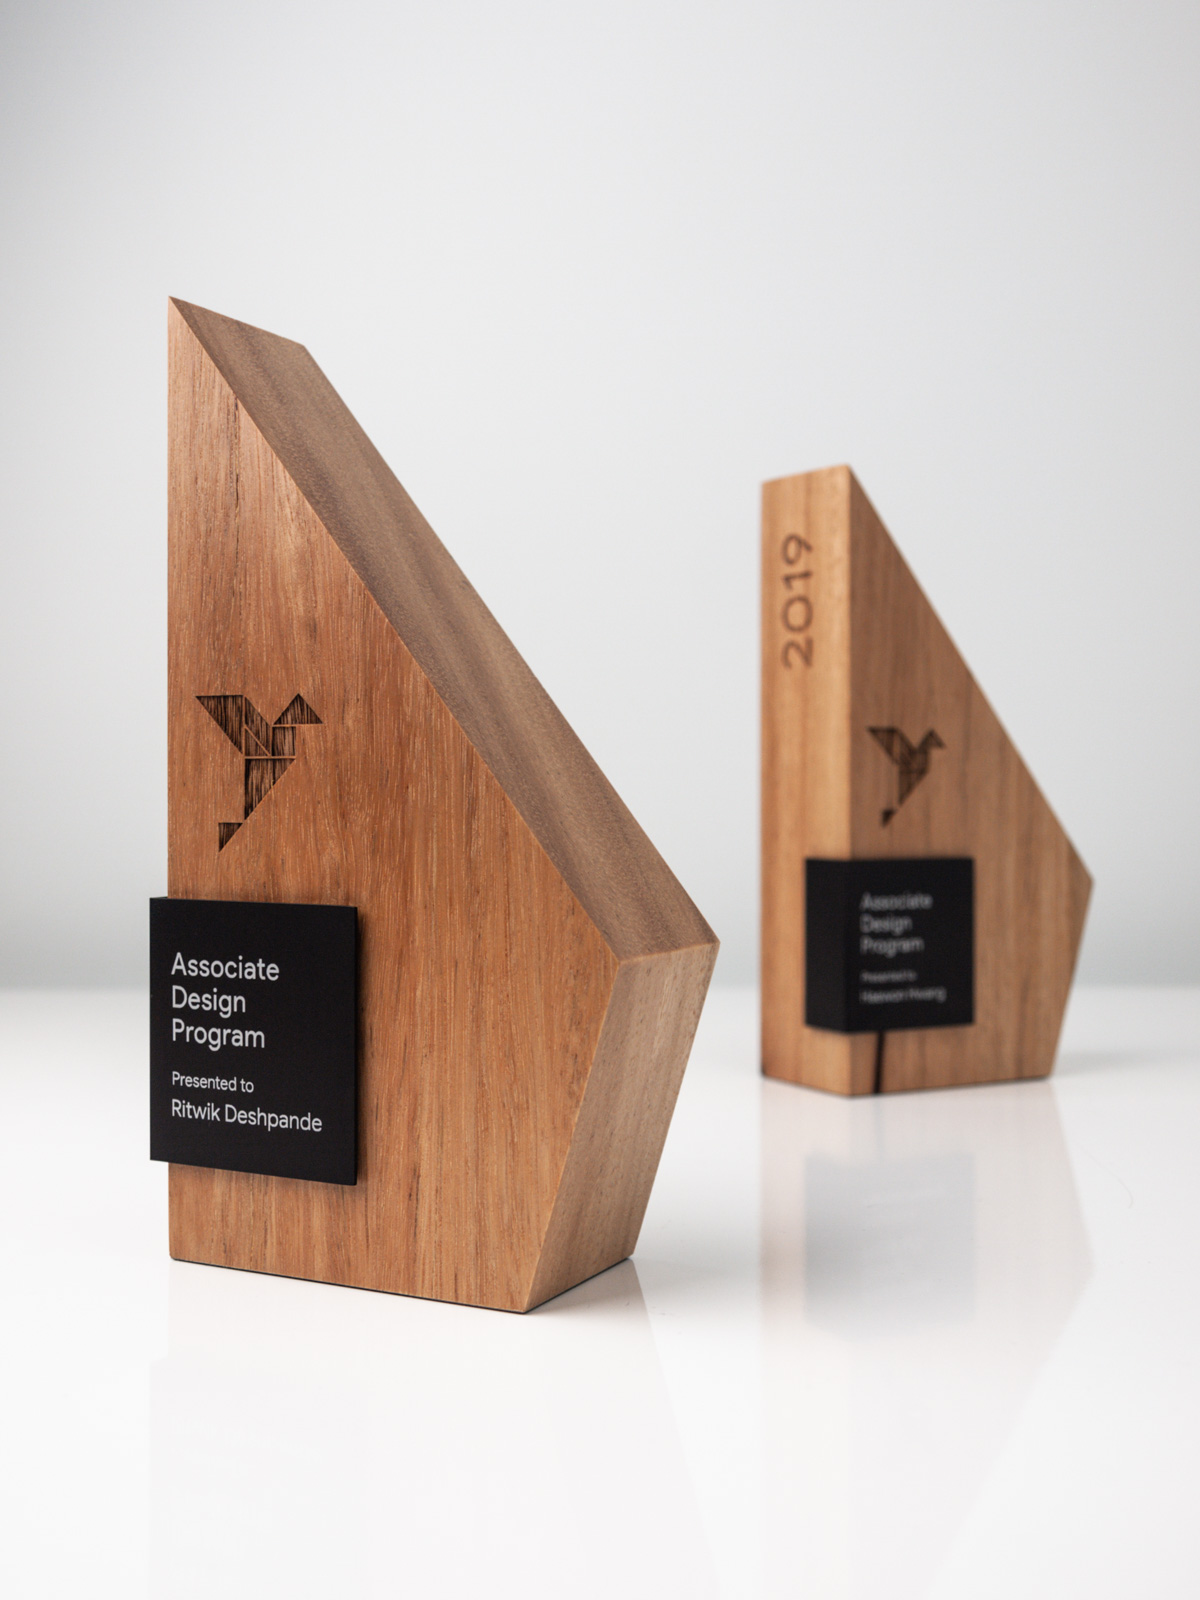 The Google Associate Design Program Sustainable Forma Trophies